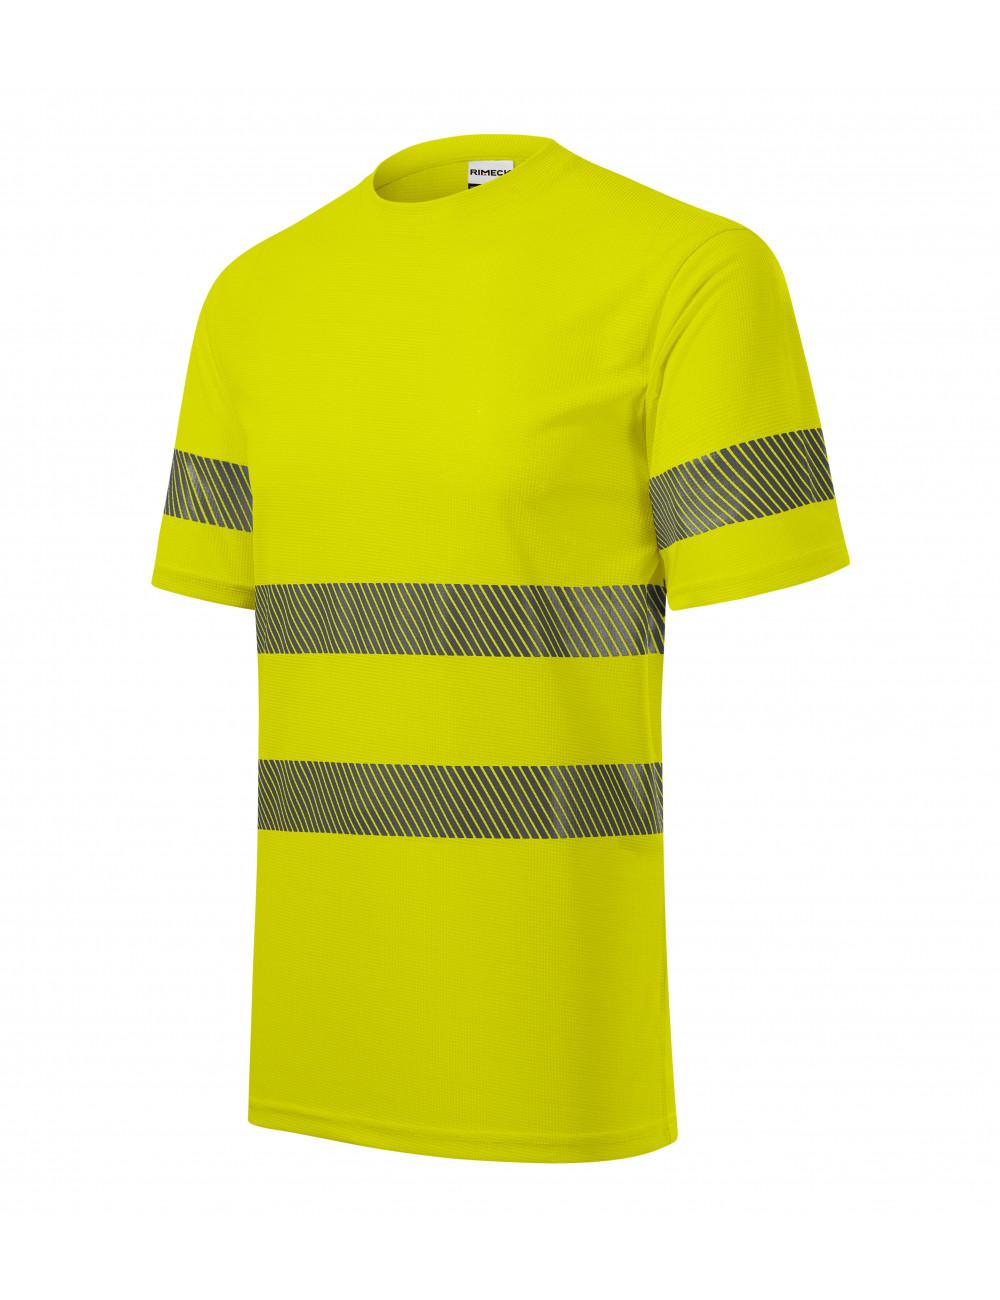 Adler RIMECK Koszulka unisex HV Dry 1V8 fluorescencyjny żółty